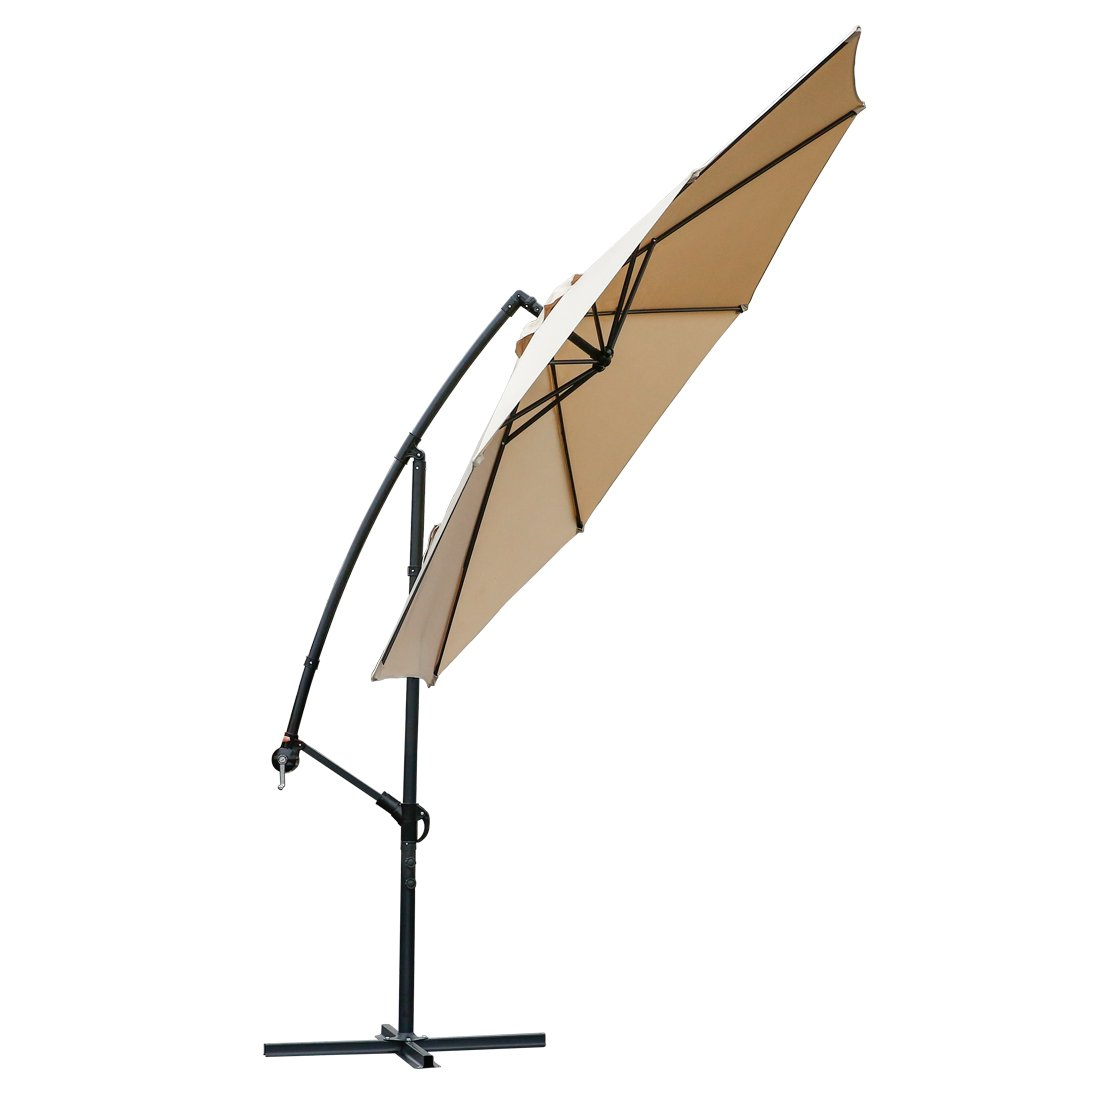 FARLAND Offset Umbrella 10 Ft Cantilever Patio Umbrella Outdoor Market Umbrellas with Cross Base (Beige)